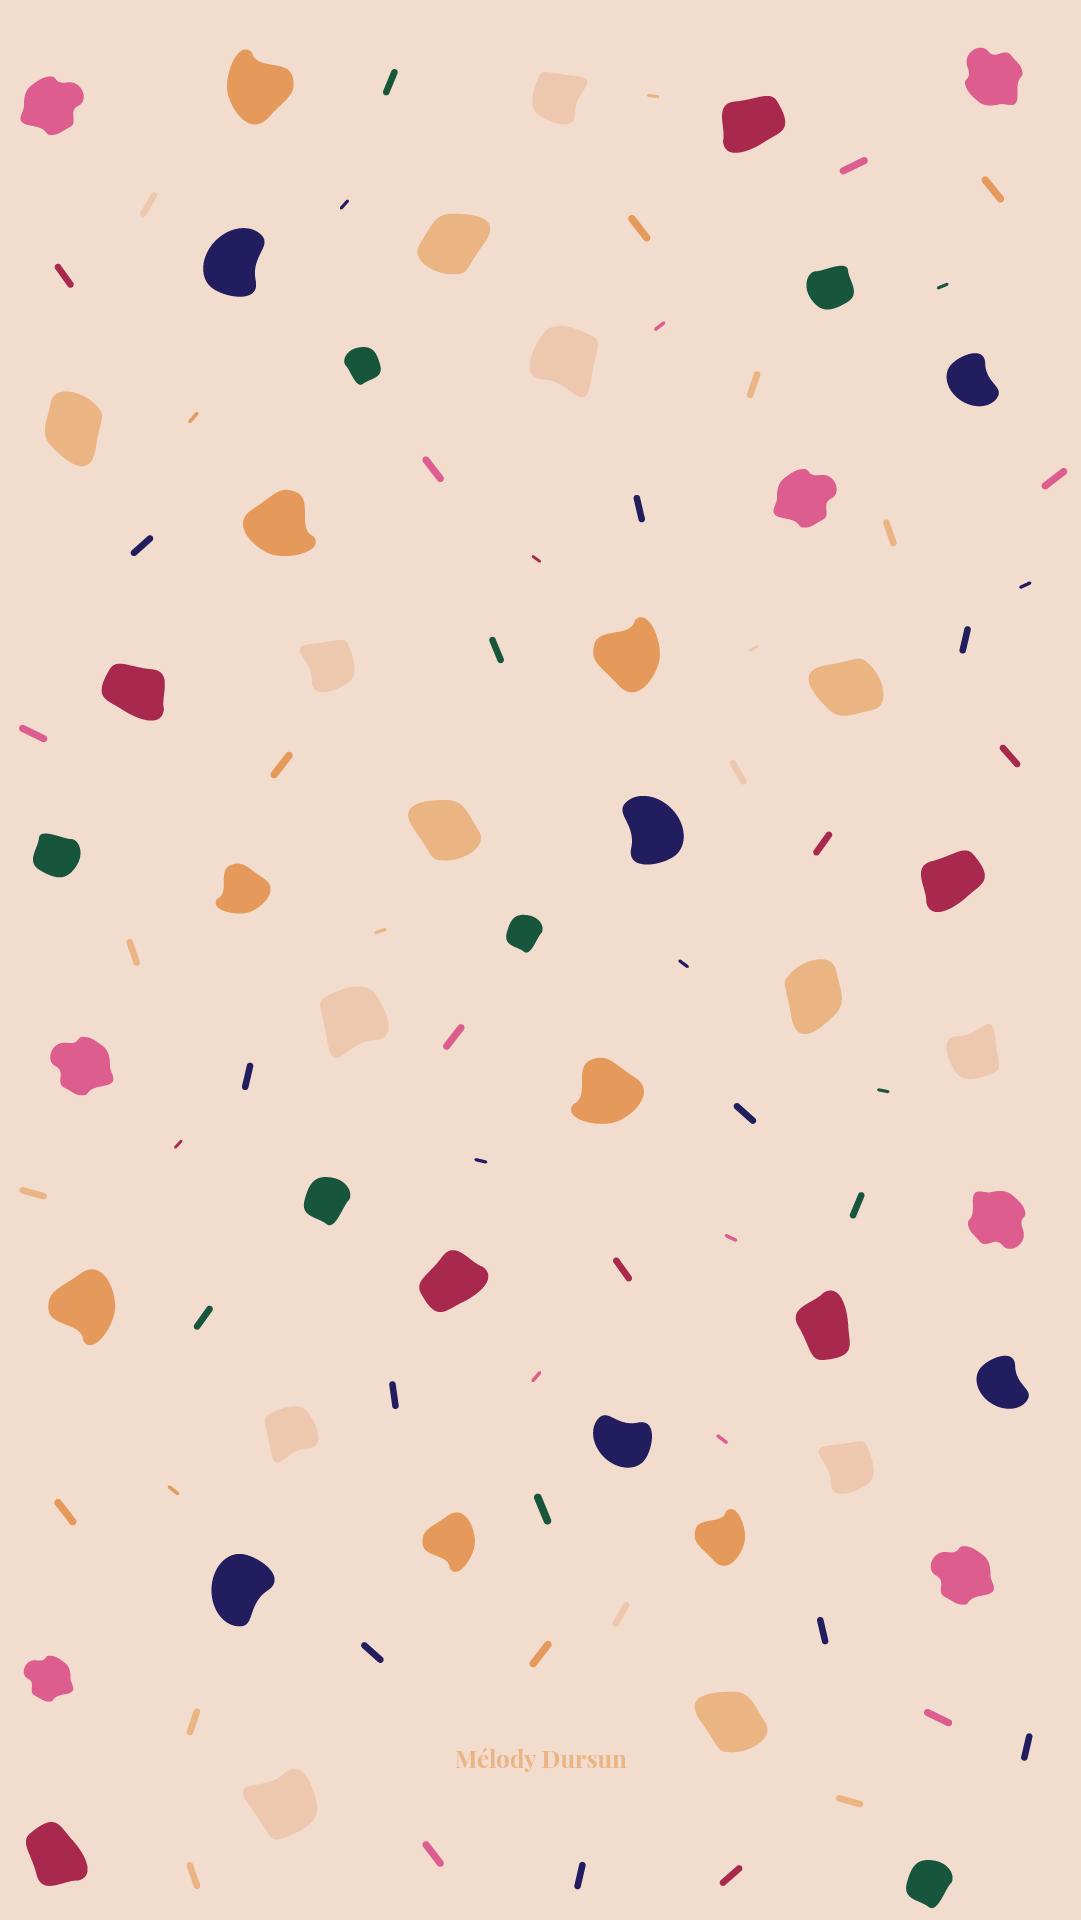 melodydursun-fond-mars2019-android